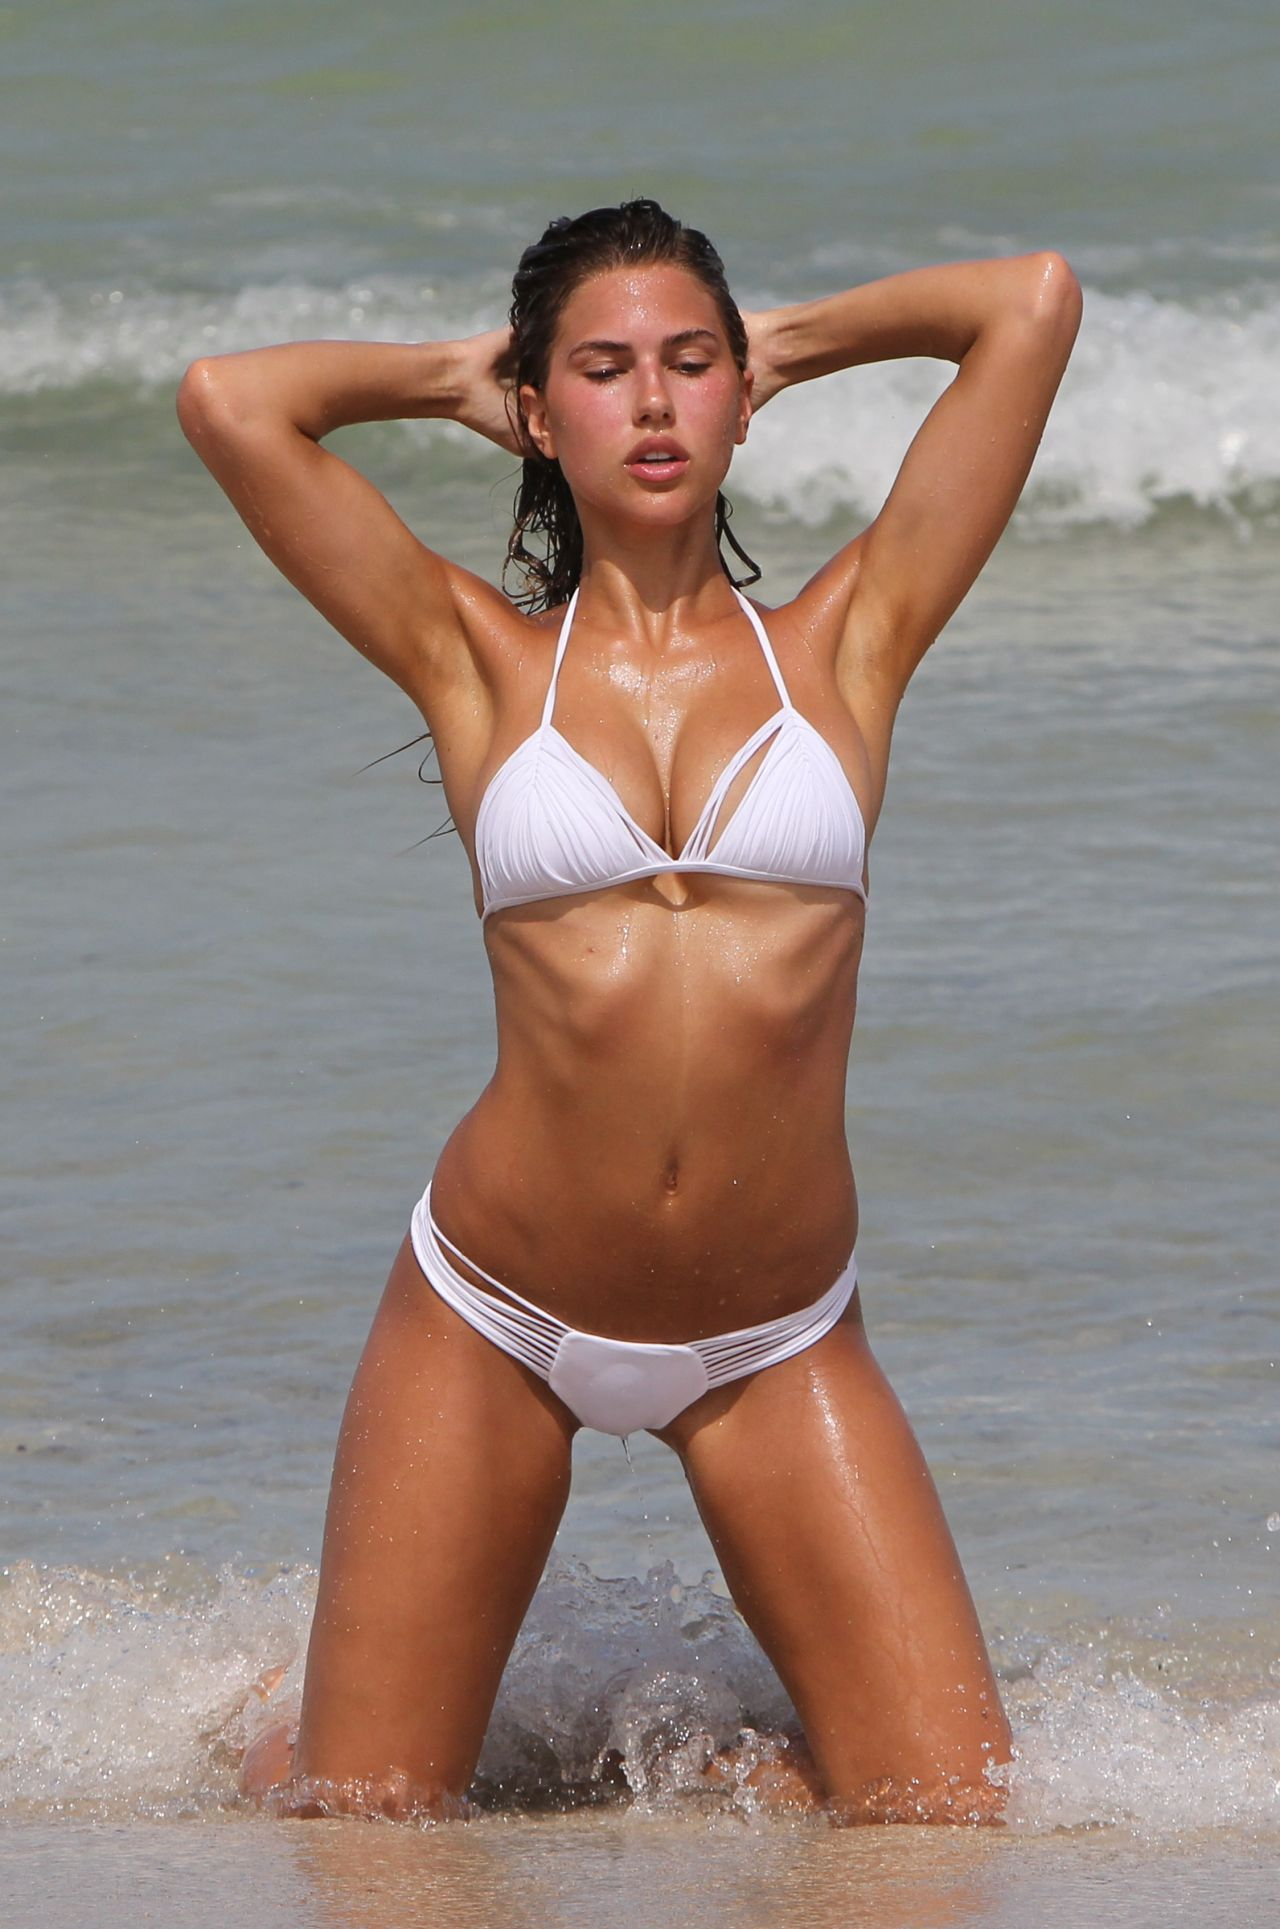 Kara Del Toro Bikini Photoshoot - Miami Beach 07242017-1871